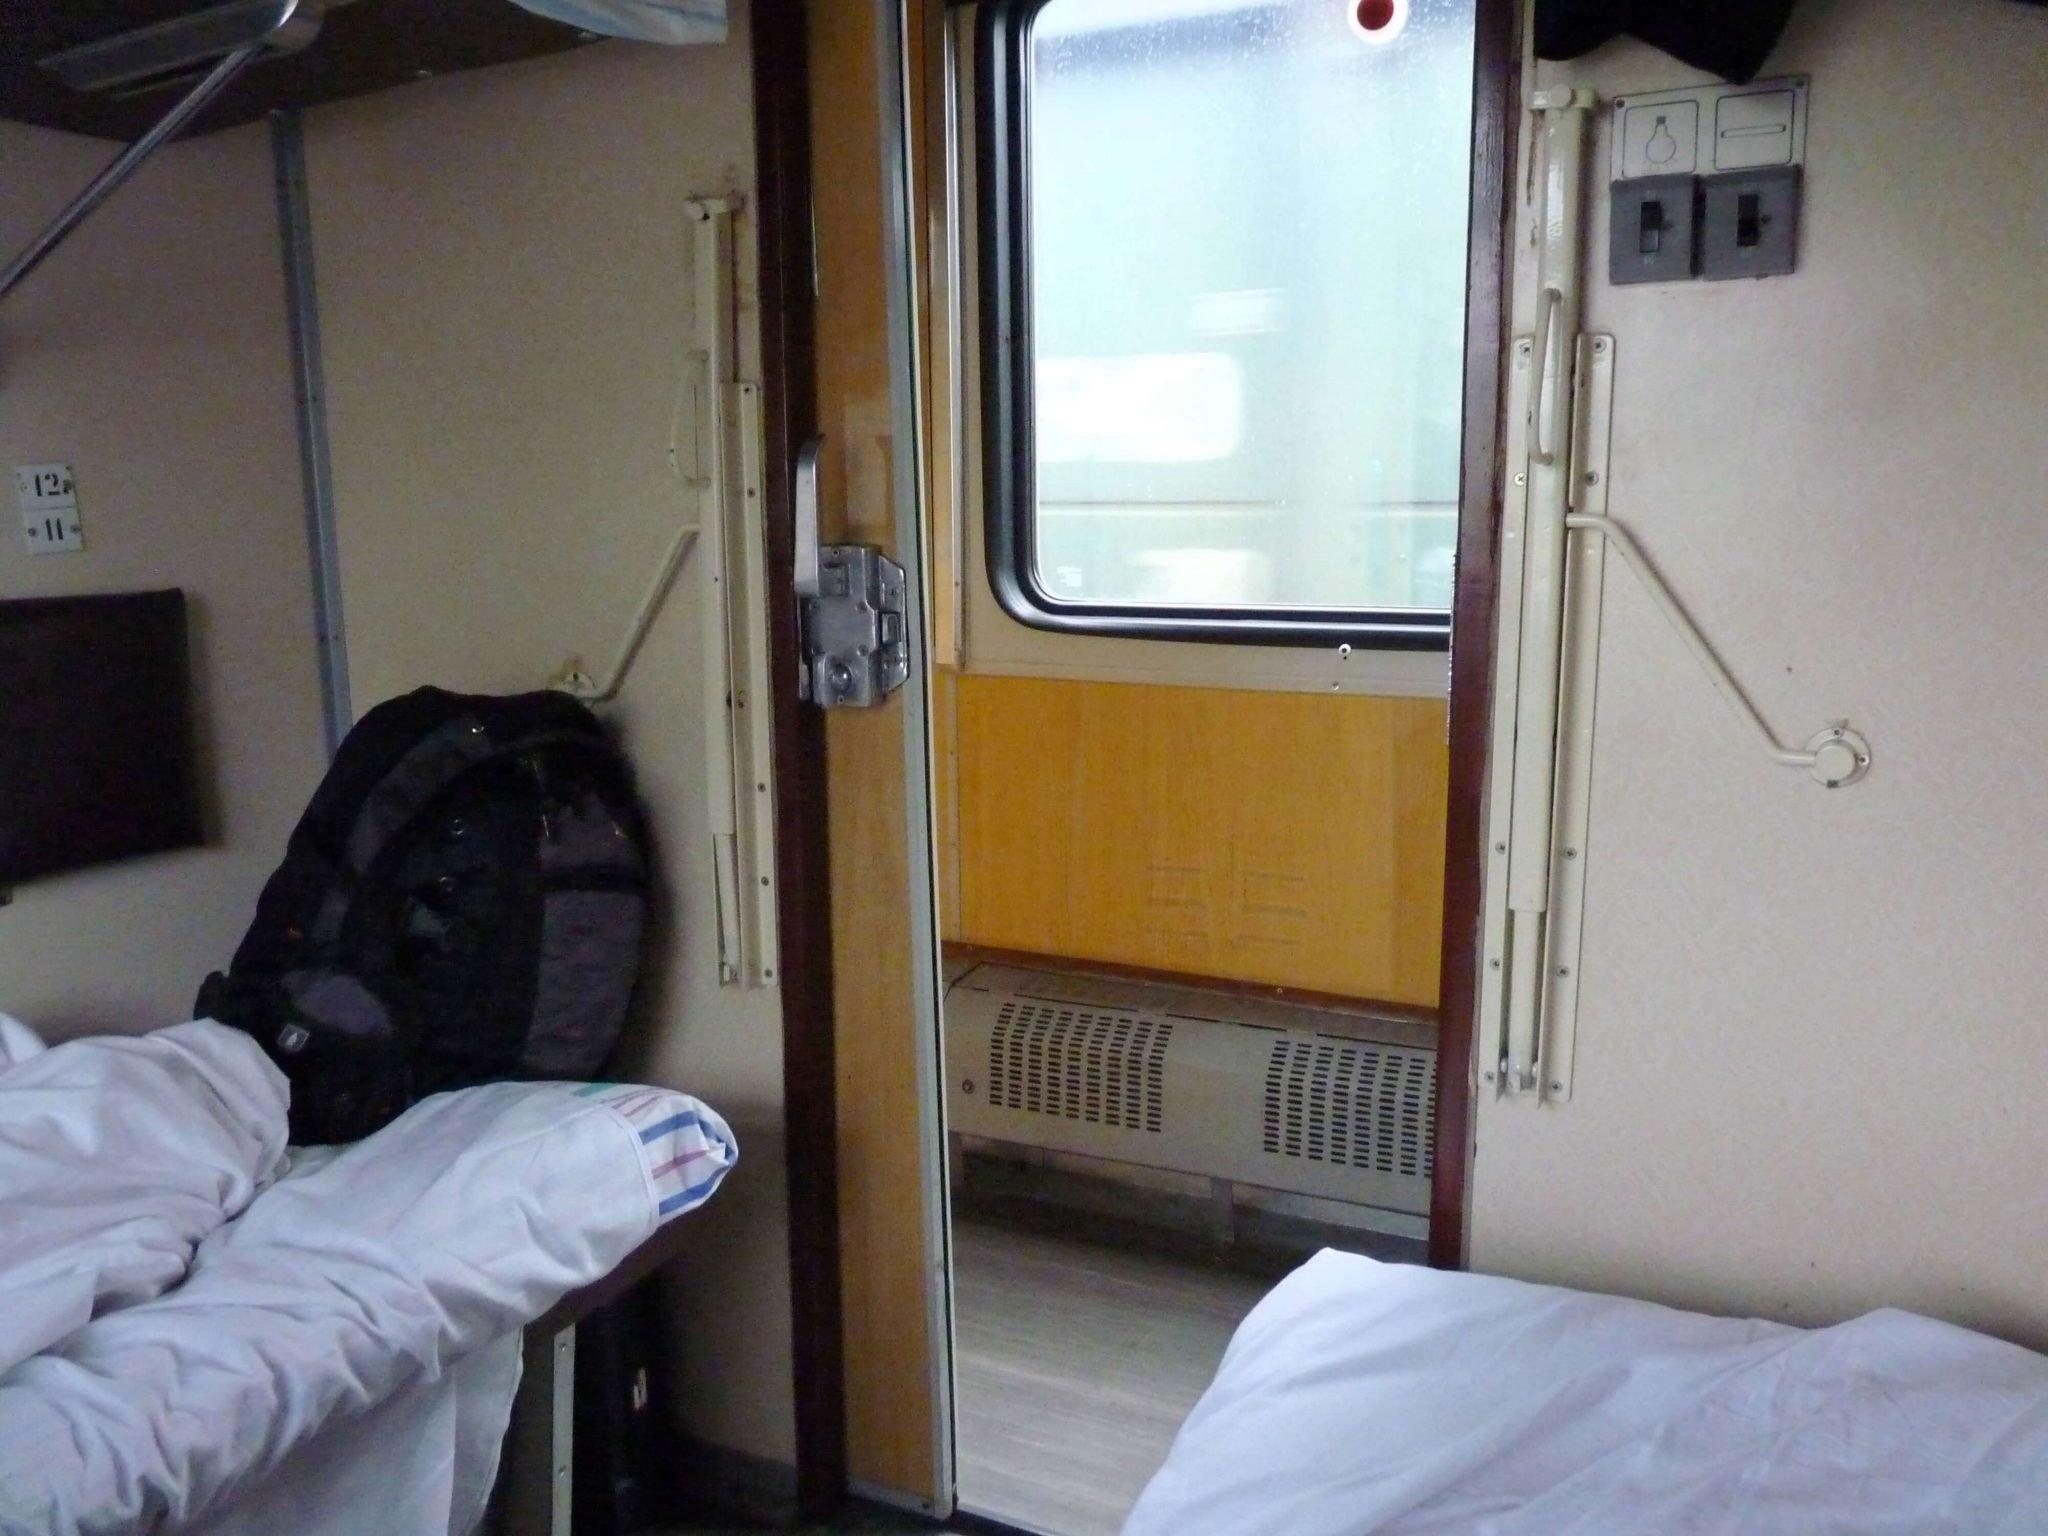 Transiberiano 2a classe interior 02 Mundo Indefinido